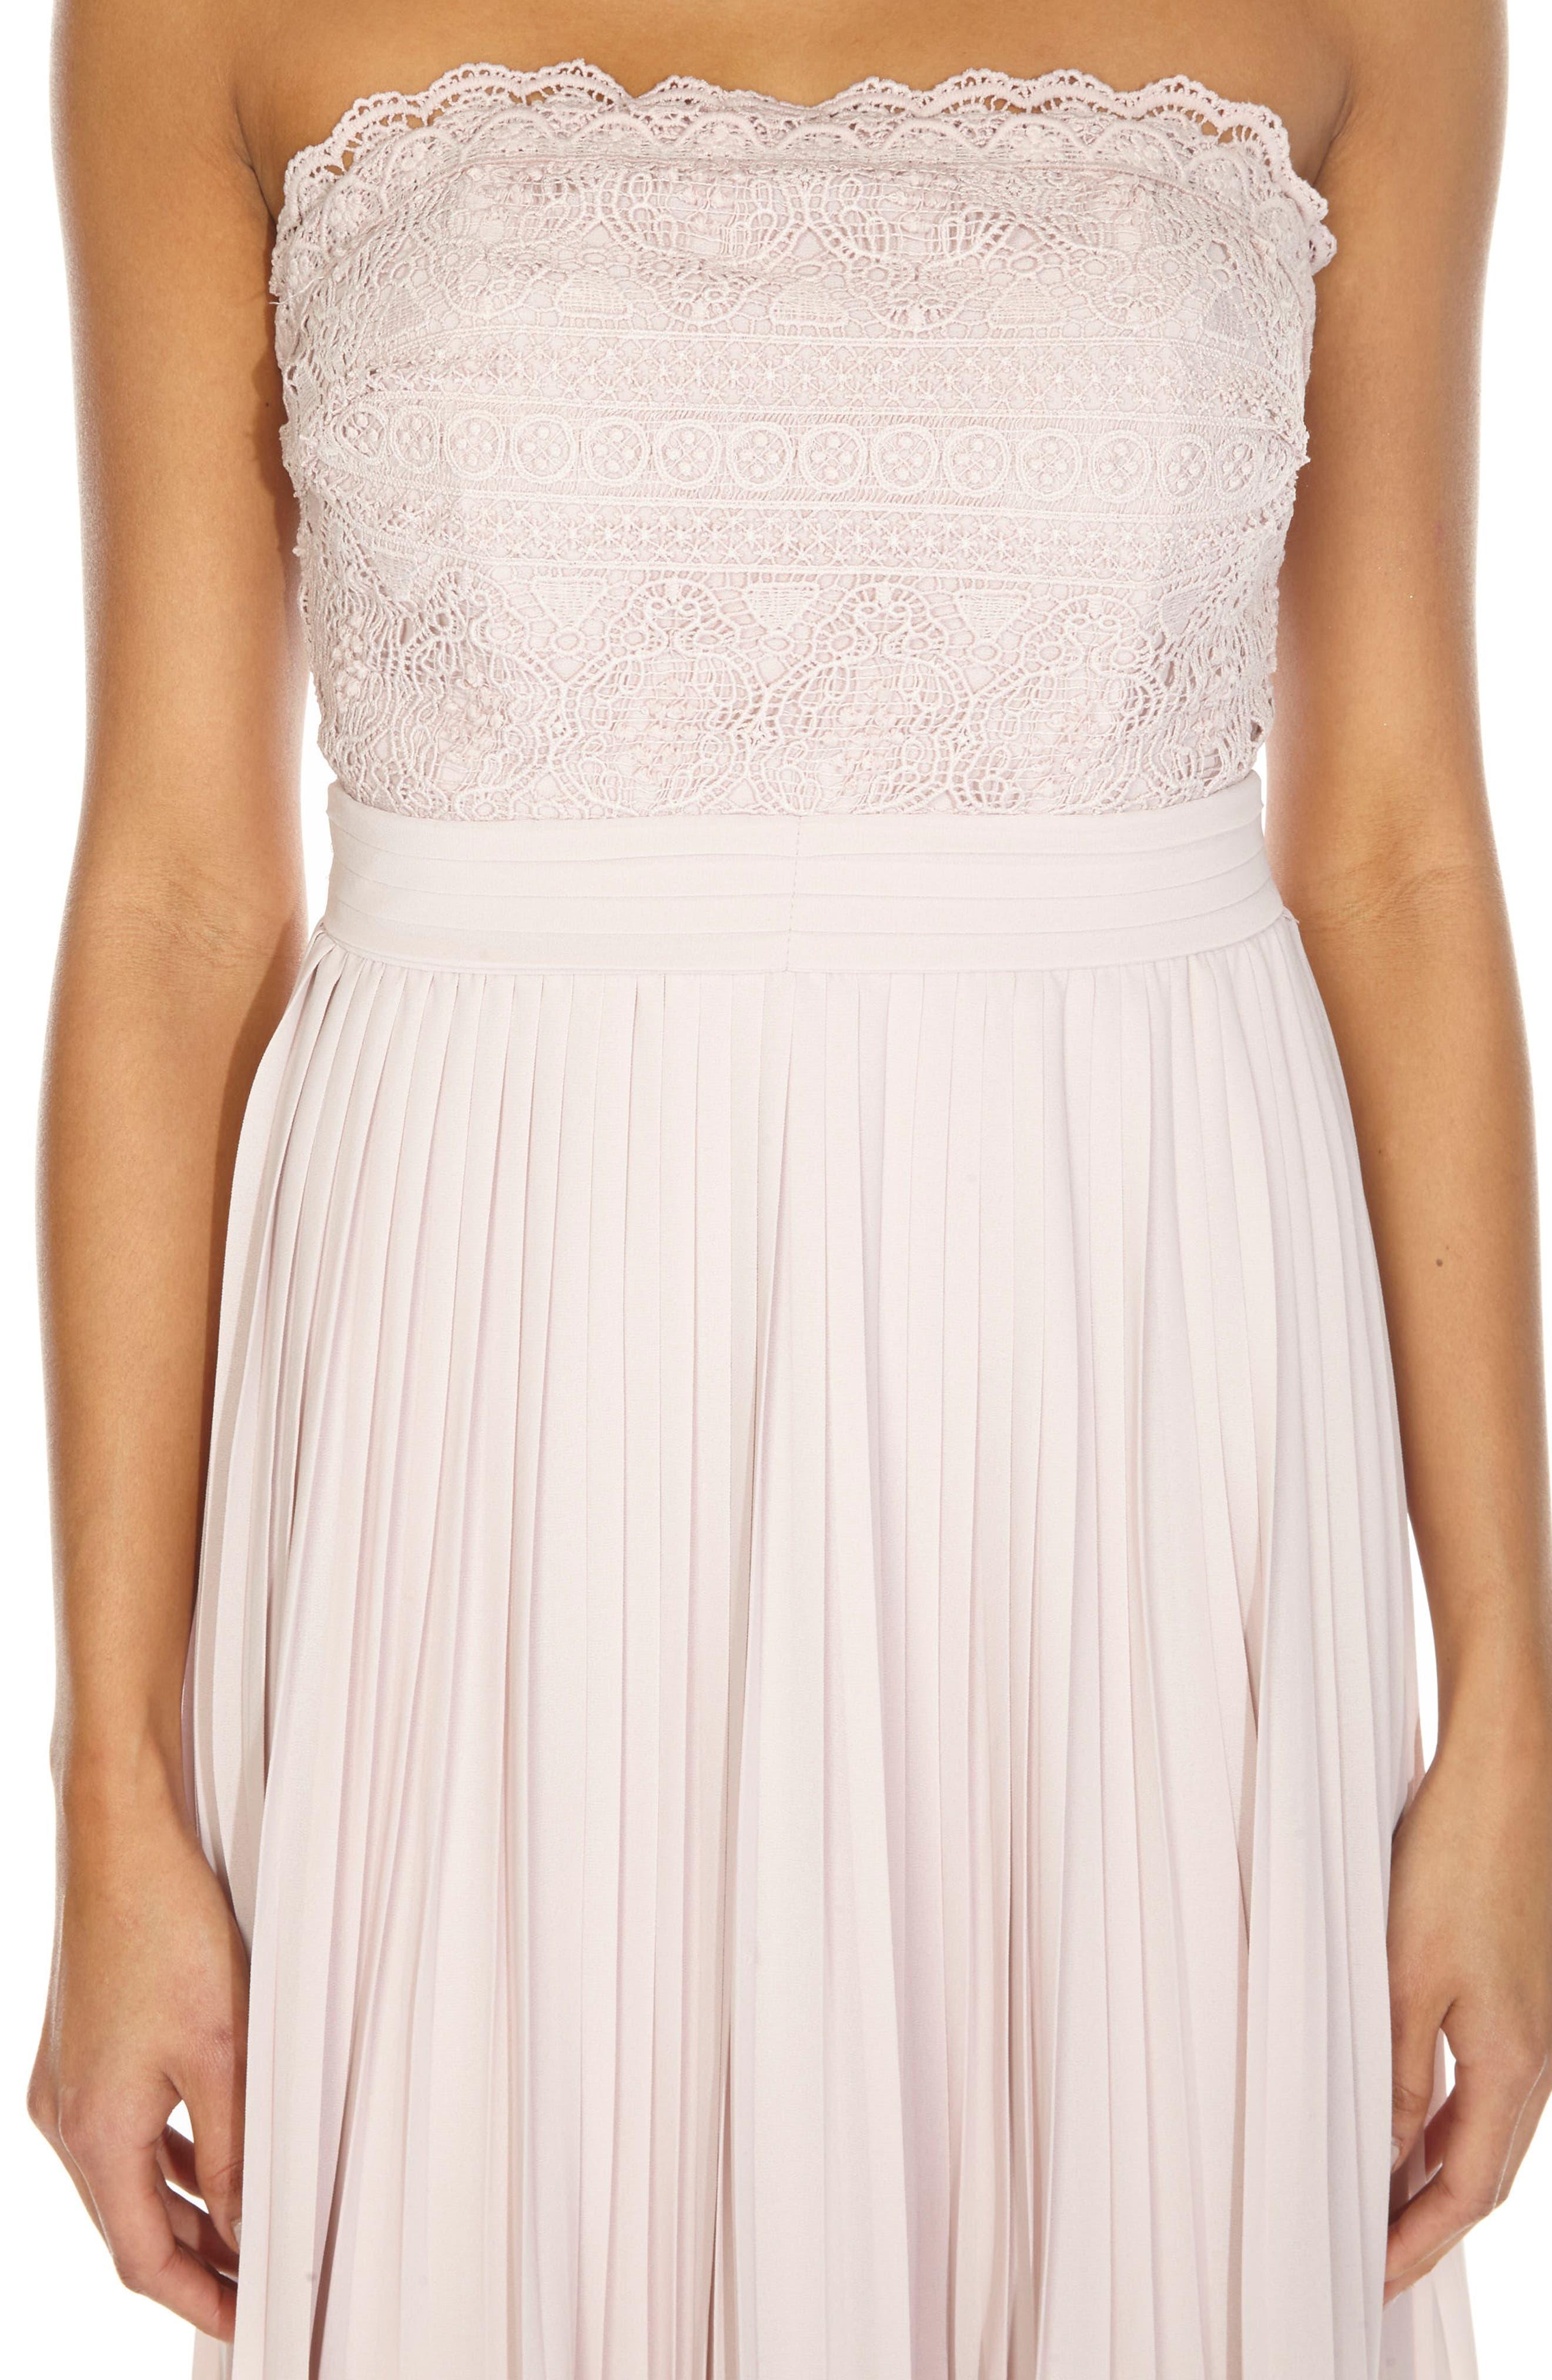 Kara Pleated Strapless Dress,                             Alternate thumbnail 3, color,                             MINK